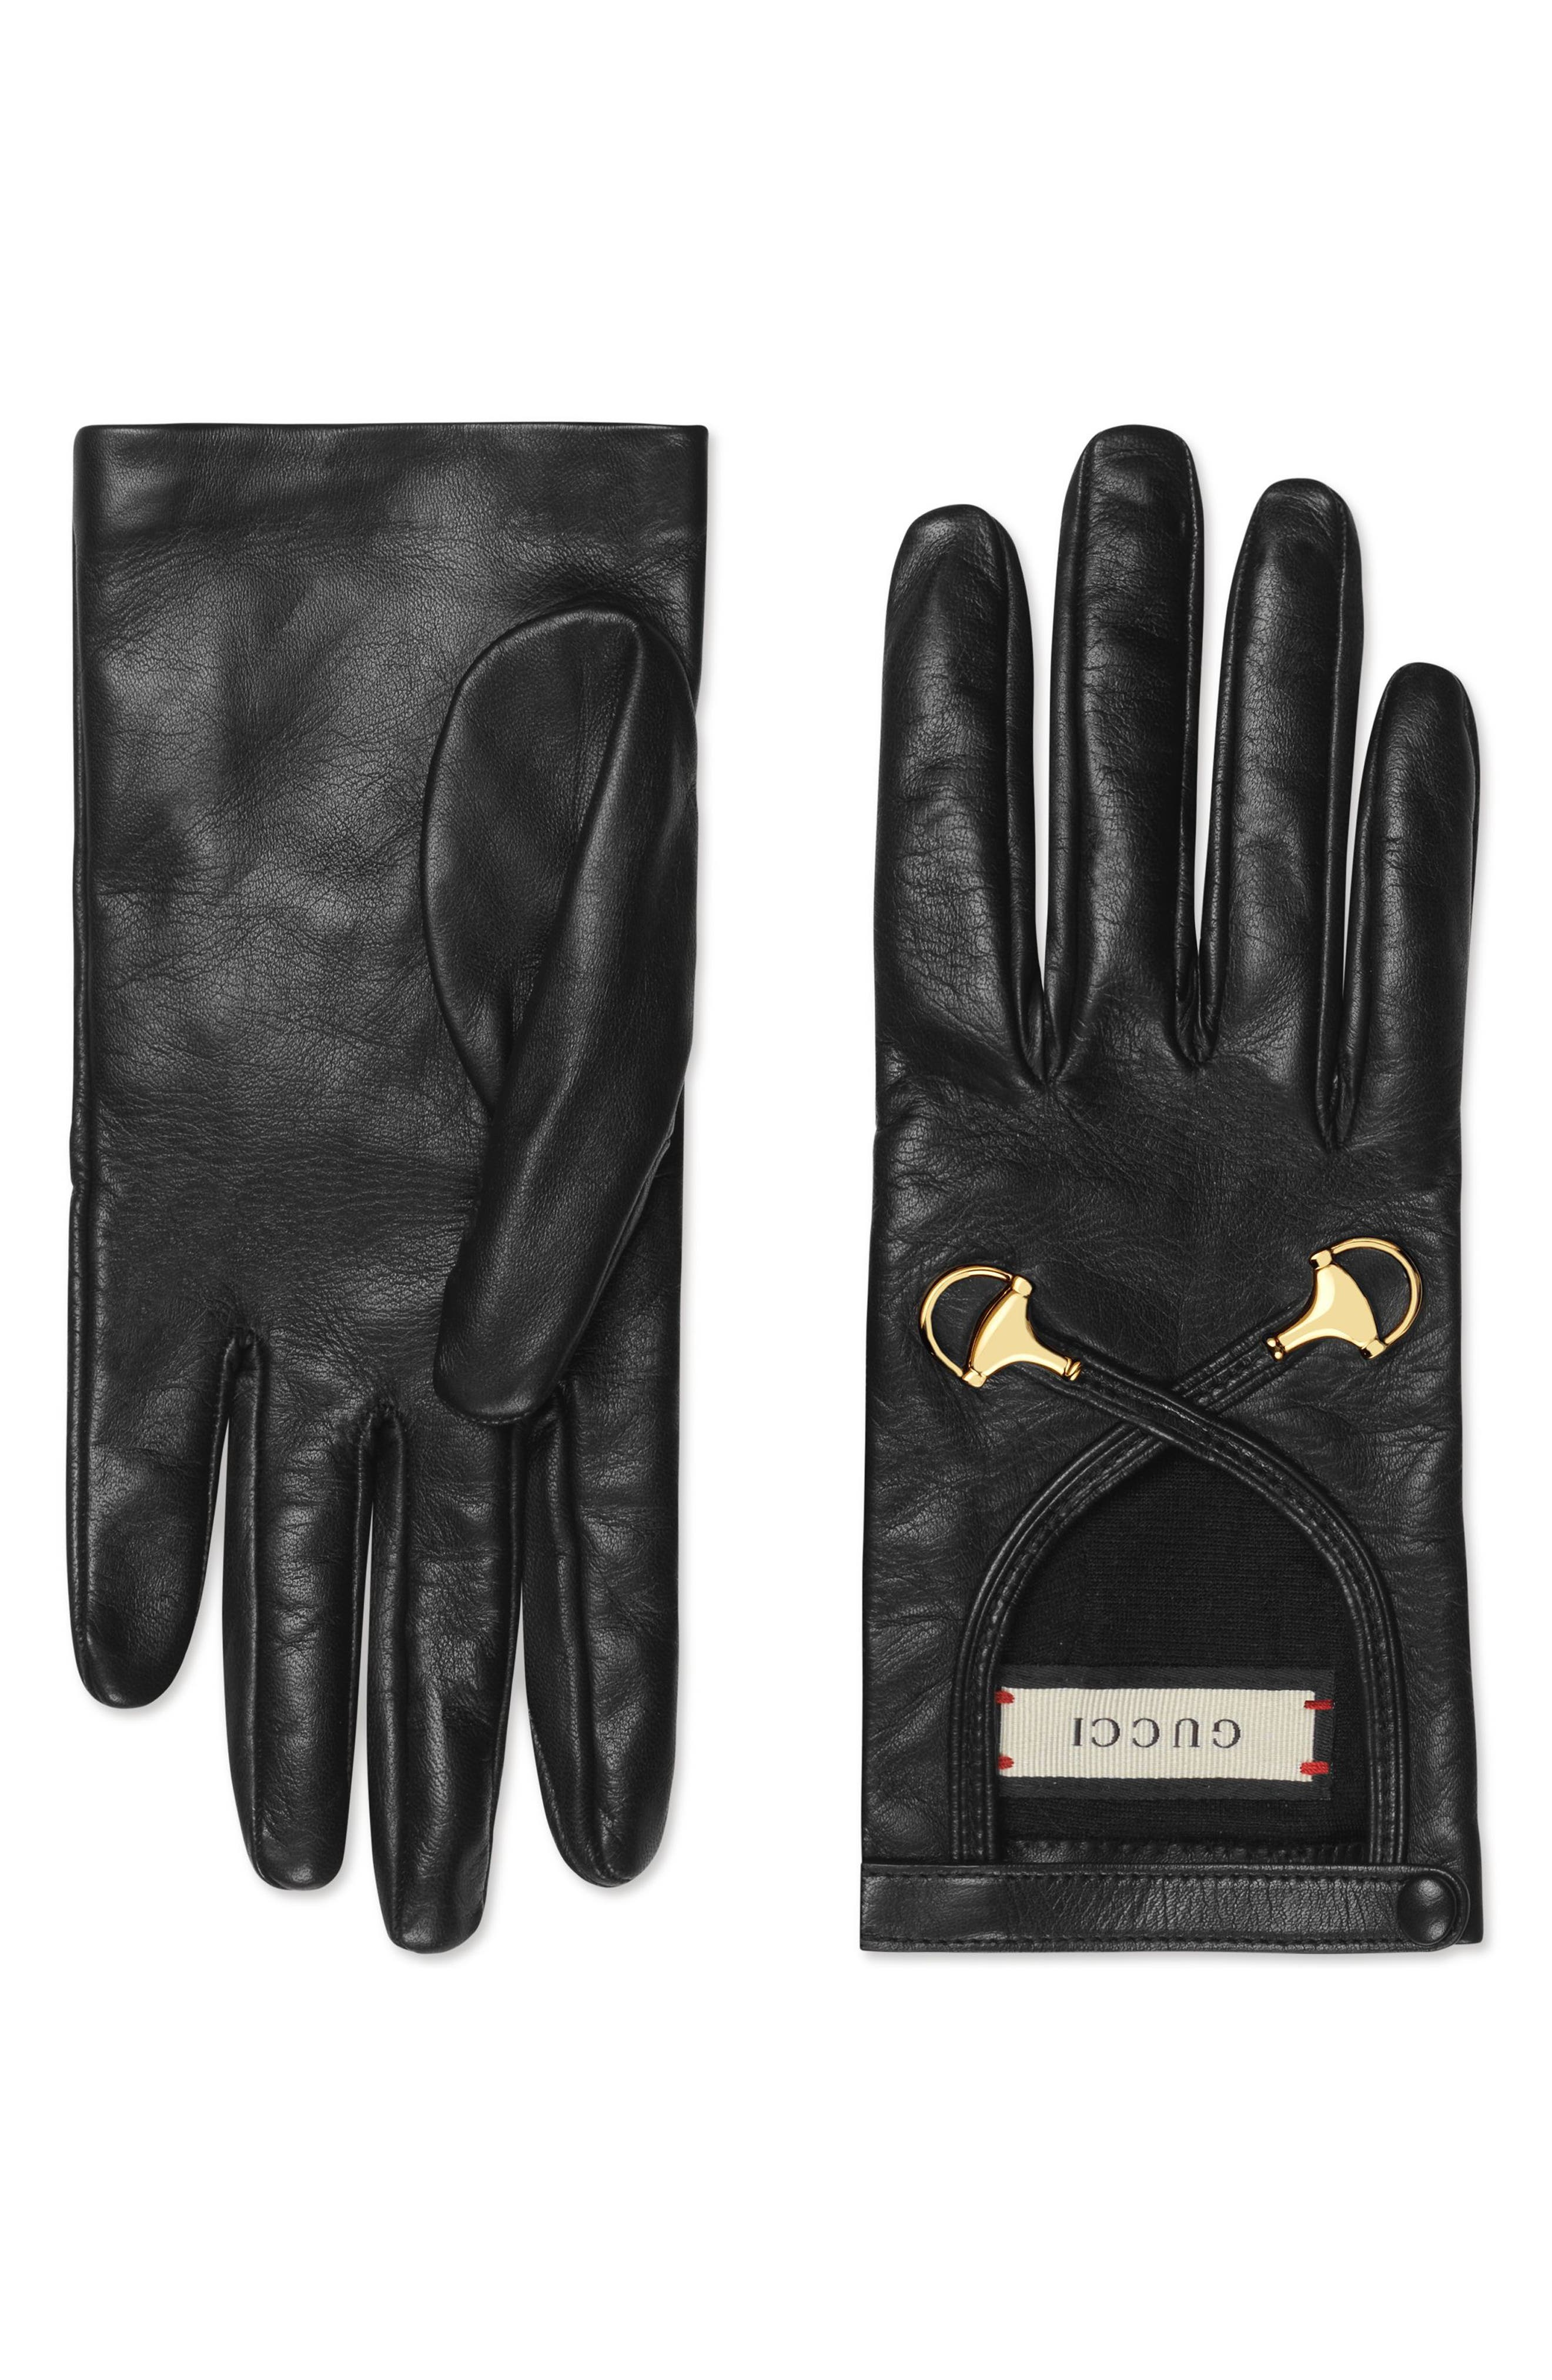 Gucci Horsebit Nappa Leather Gloves - Black